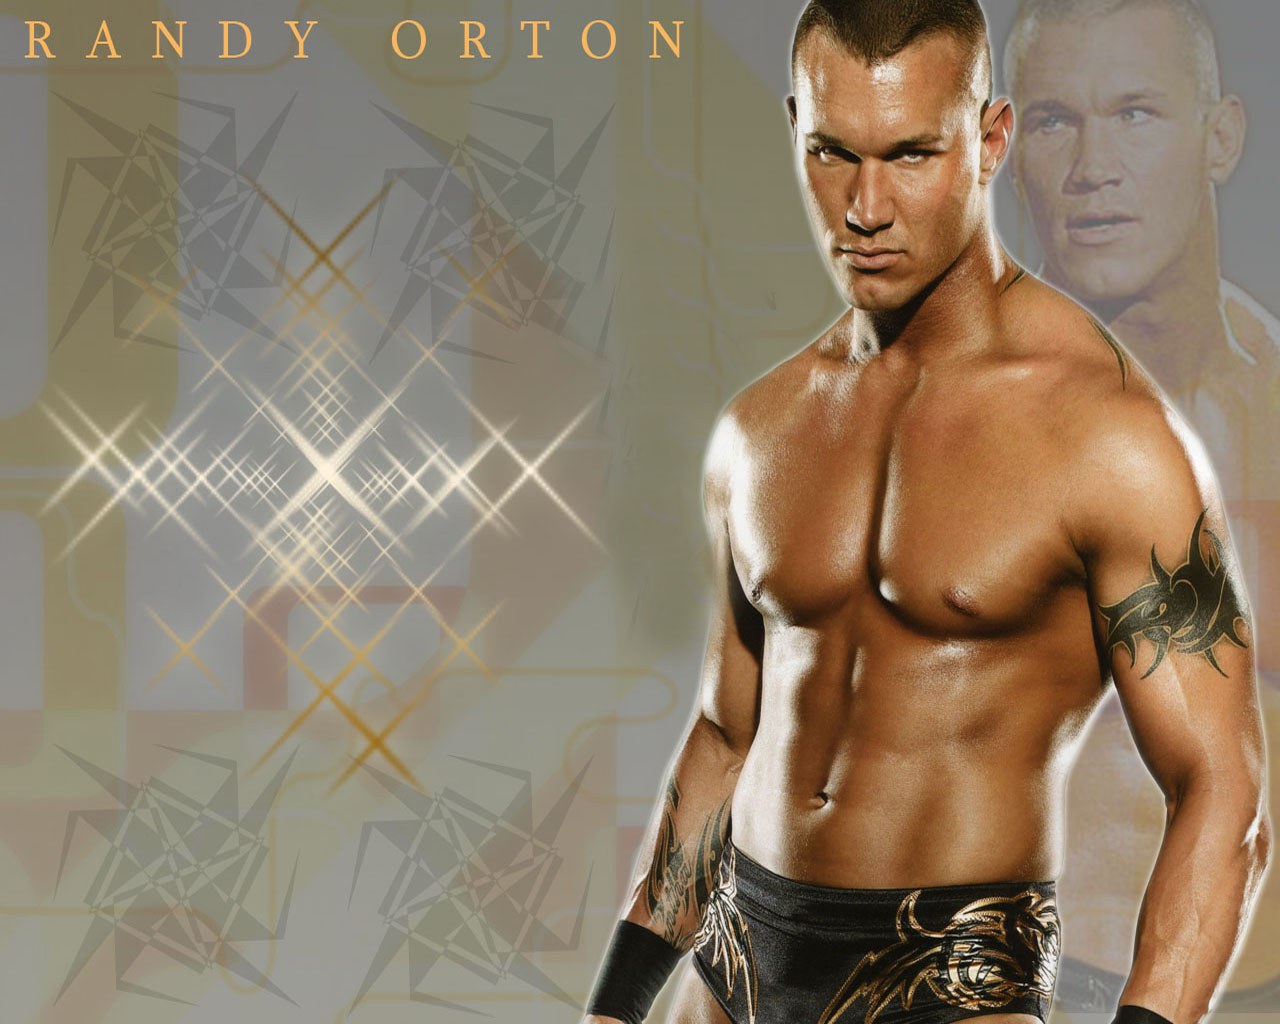 Randy Orton Tattoos: TOP HD WALLPAPERS: RANDY ORTON HD WALLPAPERS